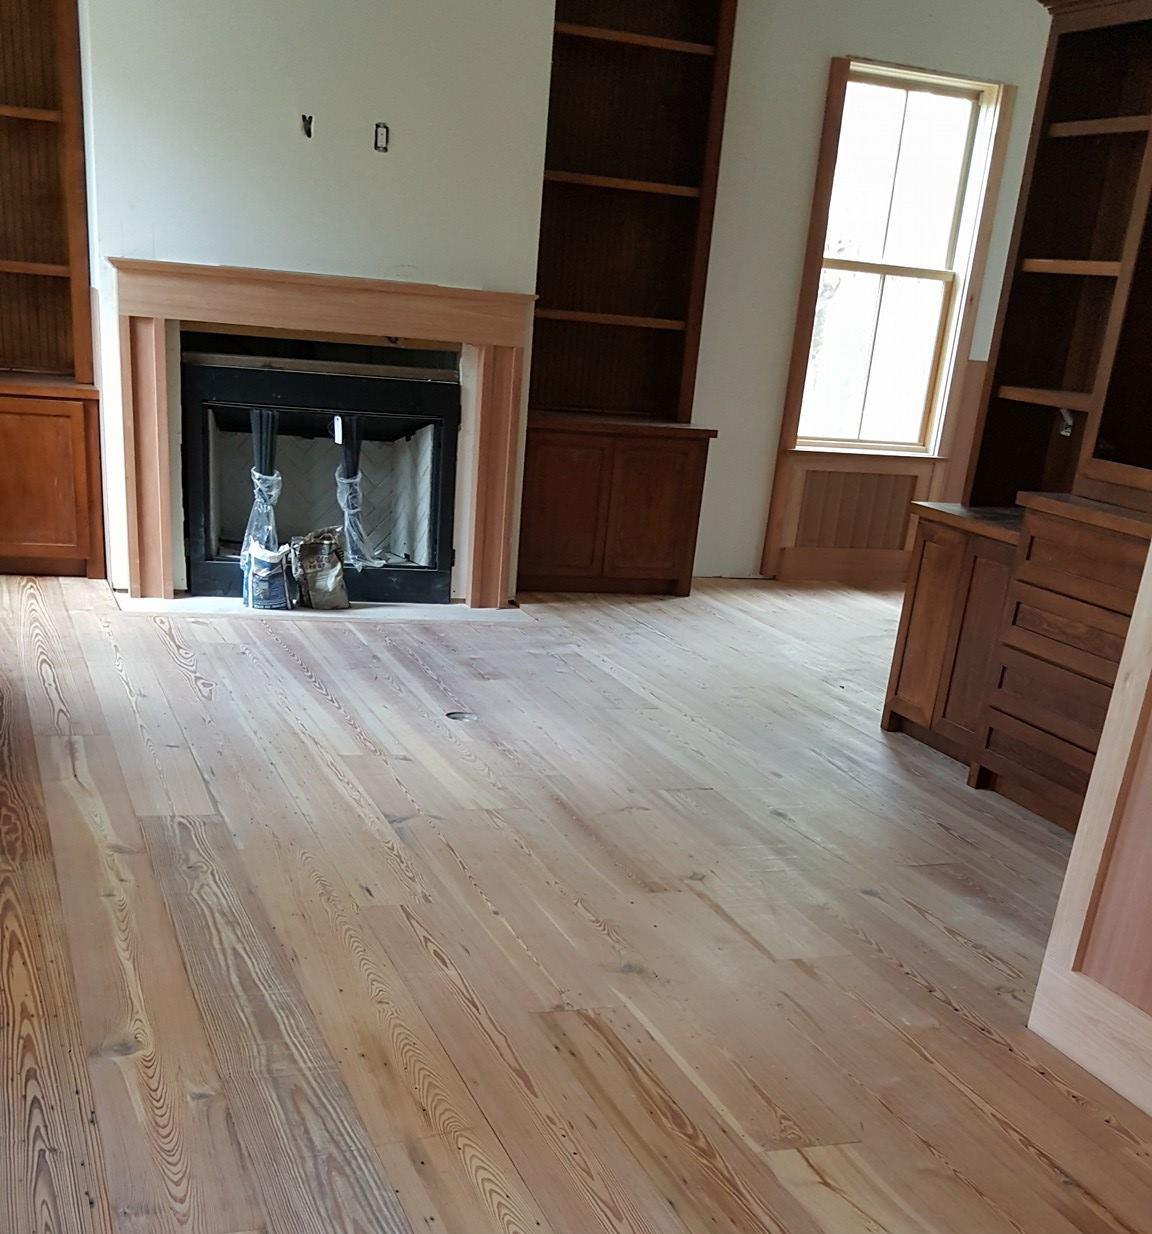 ec hardwood flooring of olde savannah hardwood flooring with regard to sand and refinish existing floors